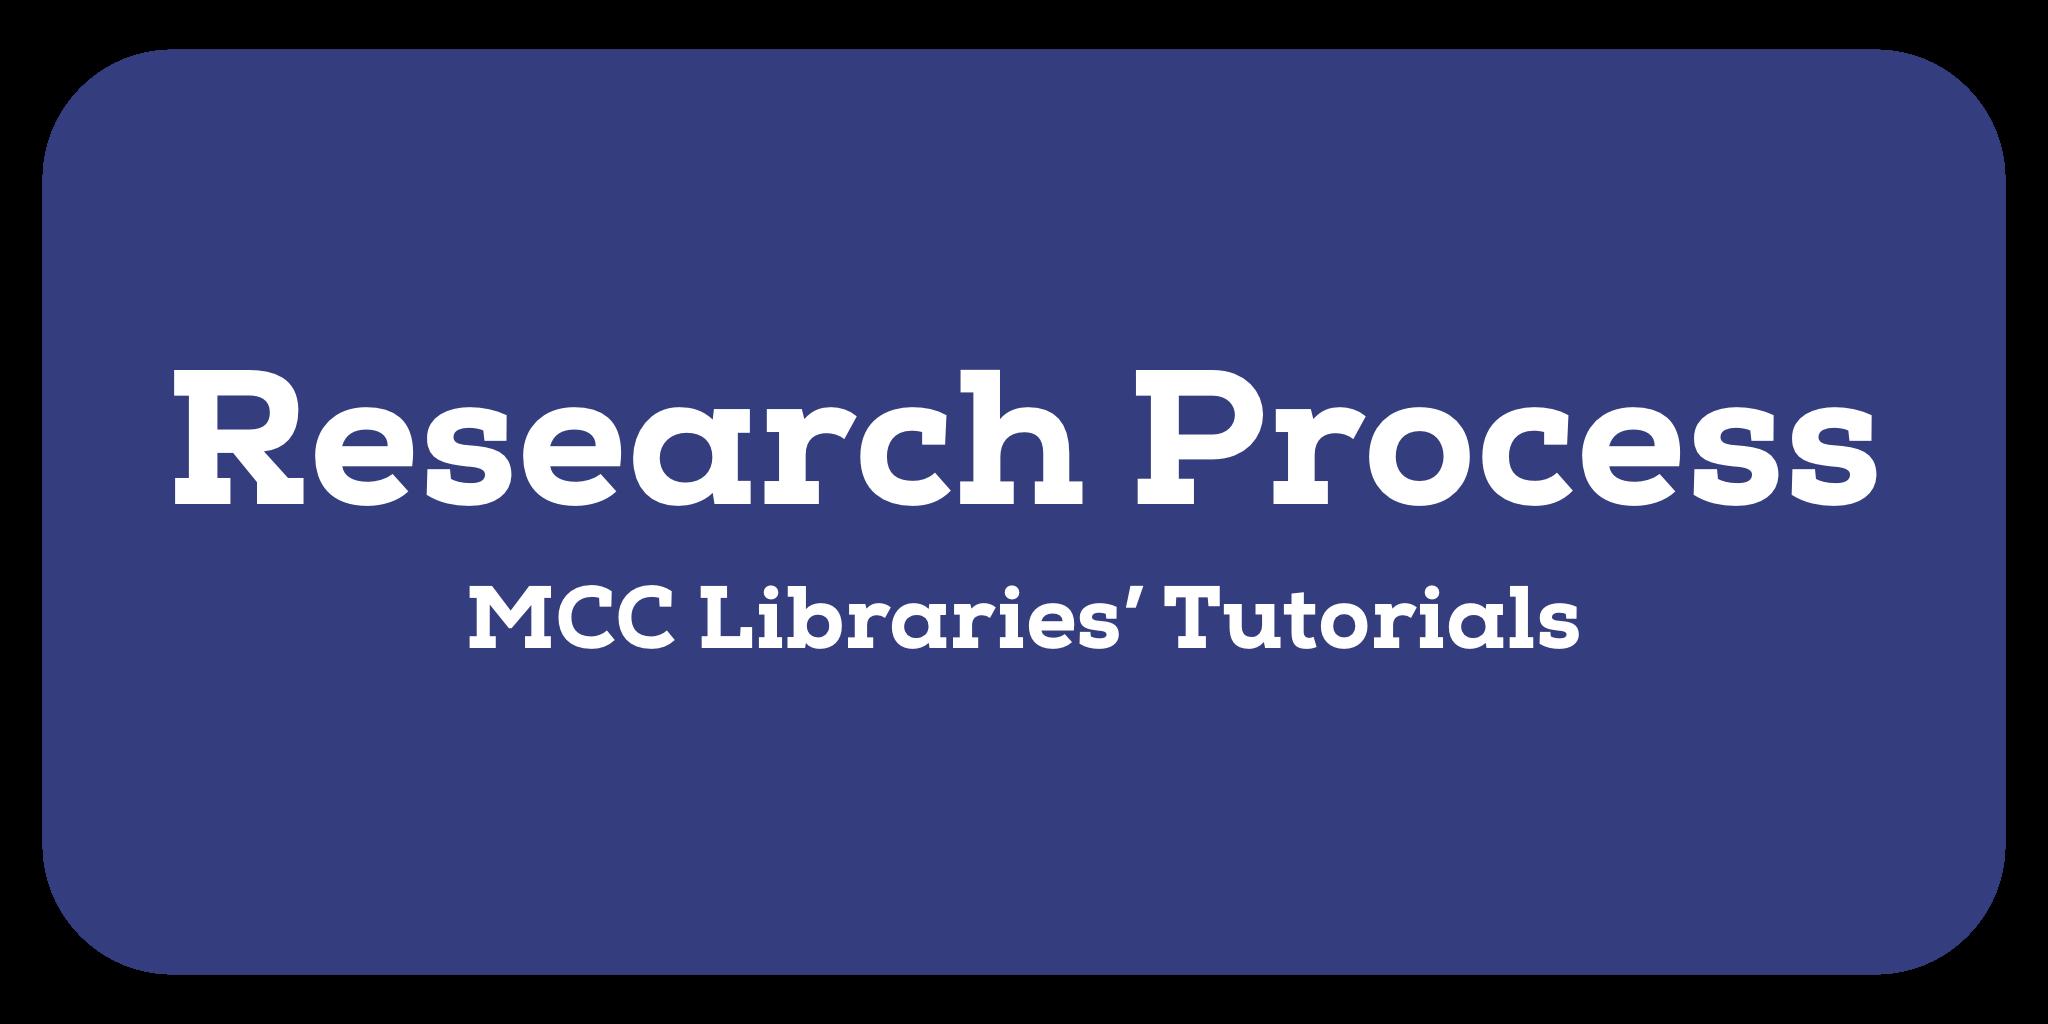 Research Process: MCC Libraries' Tutorials